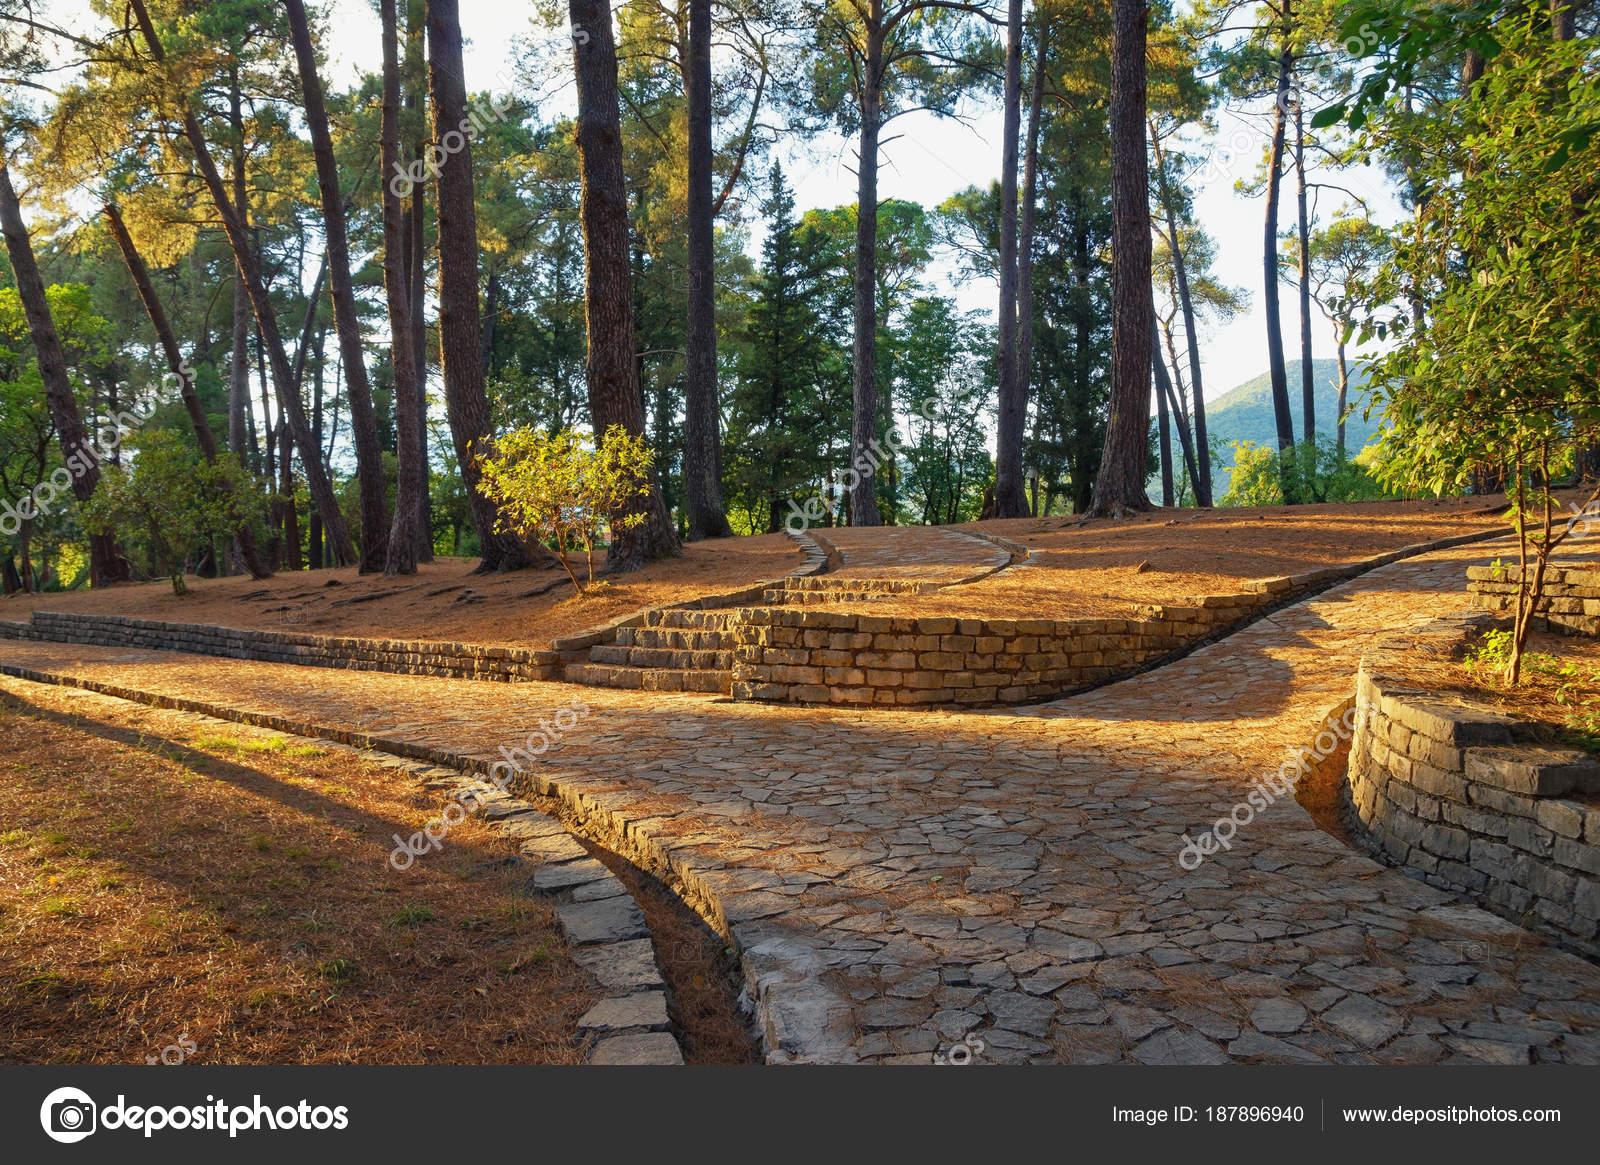 Pathways in park. Montenegro, view of botanical garden in Tivat city ...